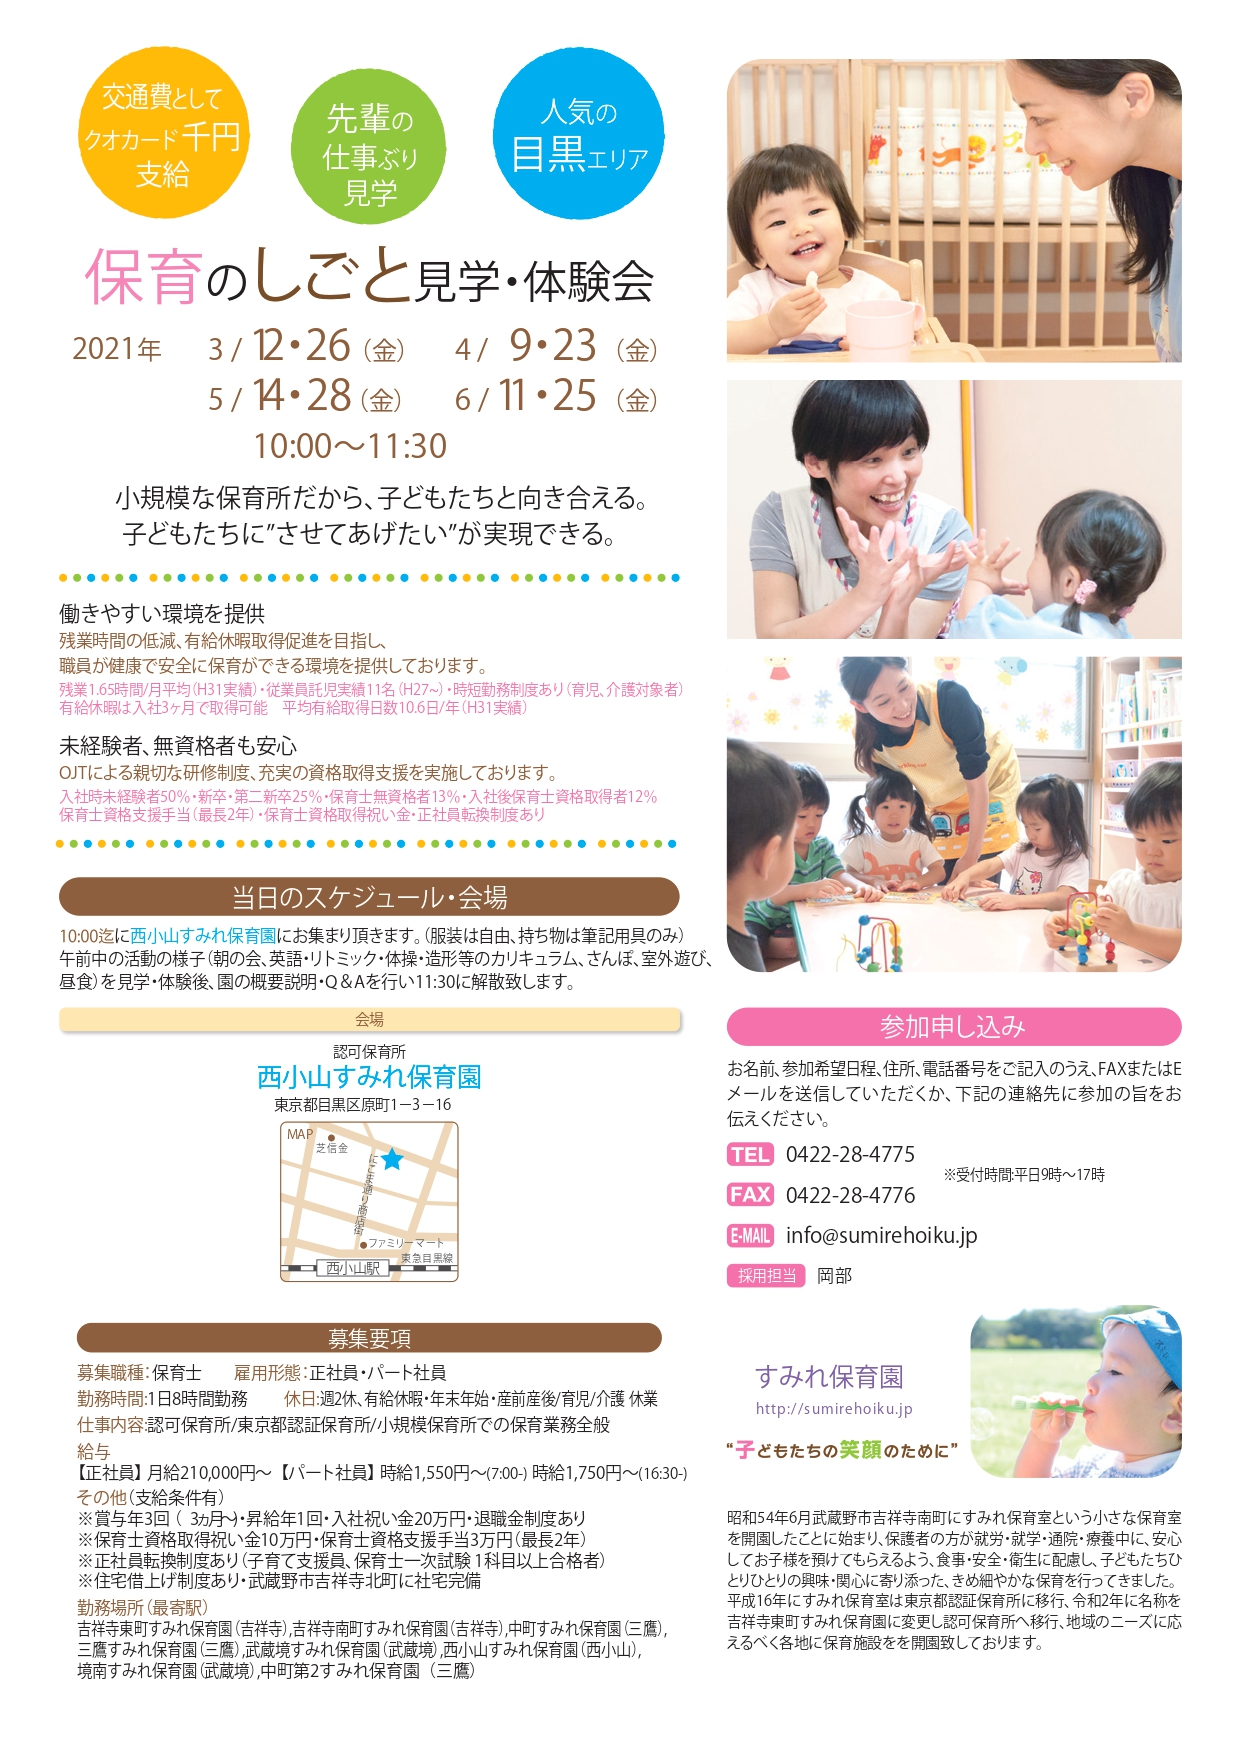 taiken_nishikoyama 2021.03-2021.06_page-0001